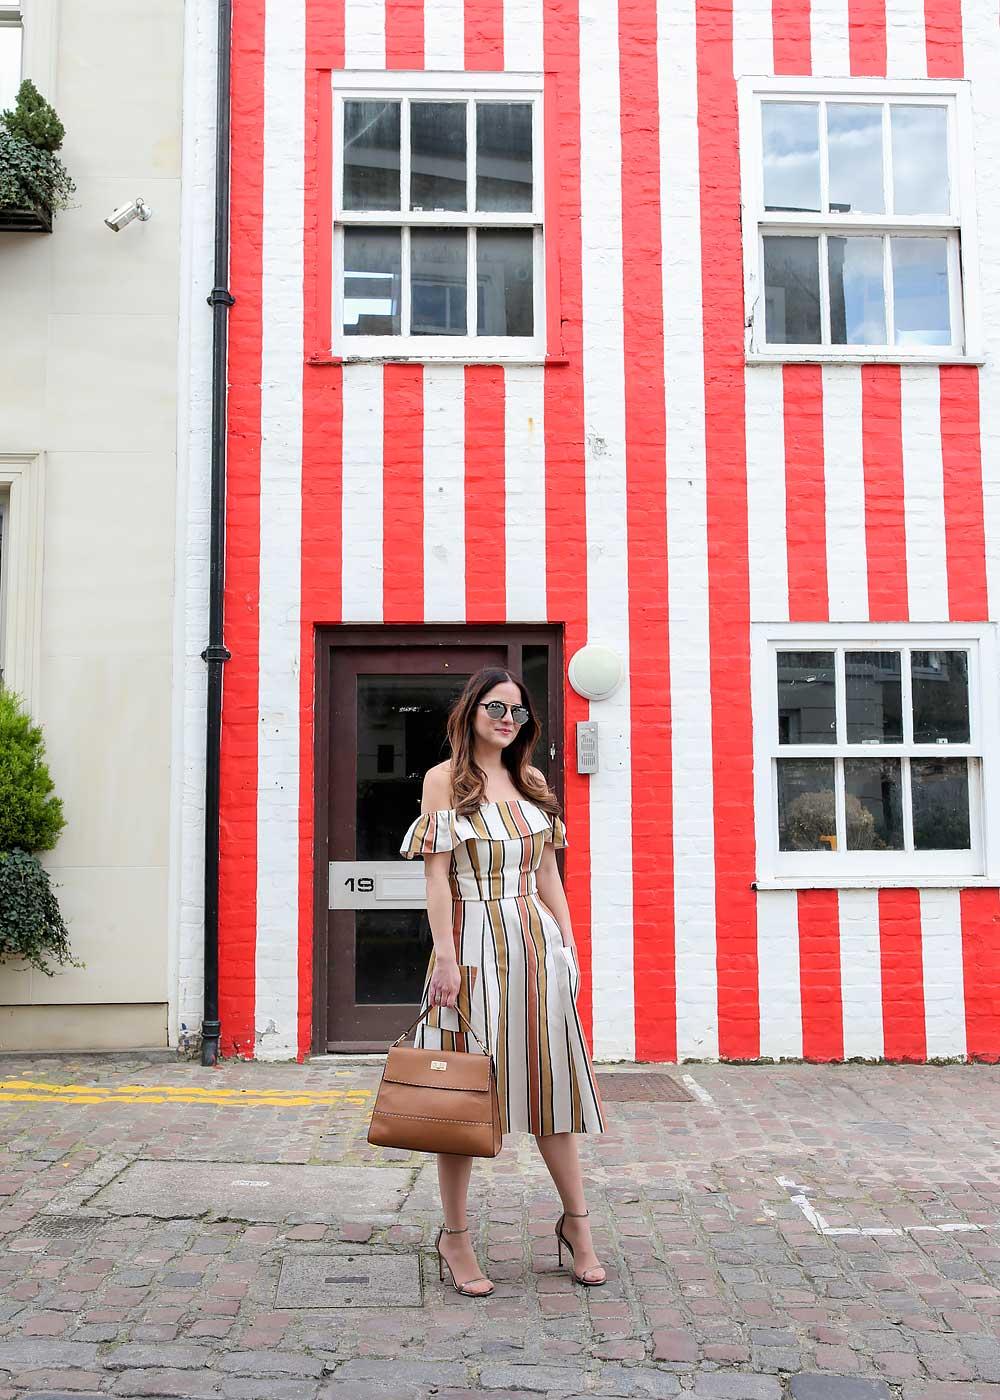 Kensington Red Striped House